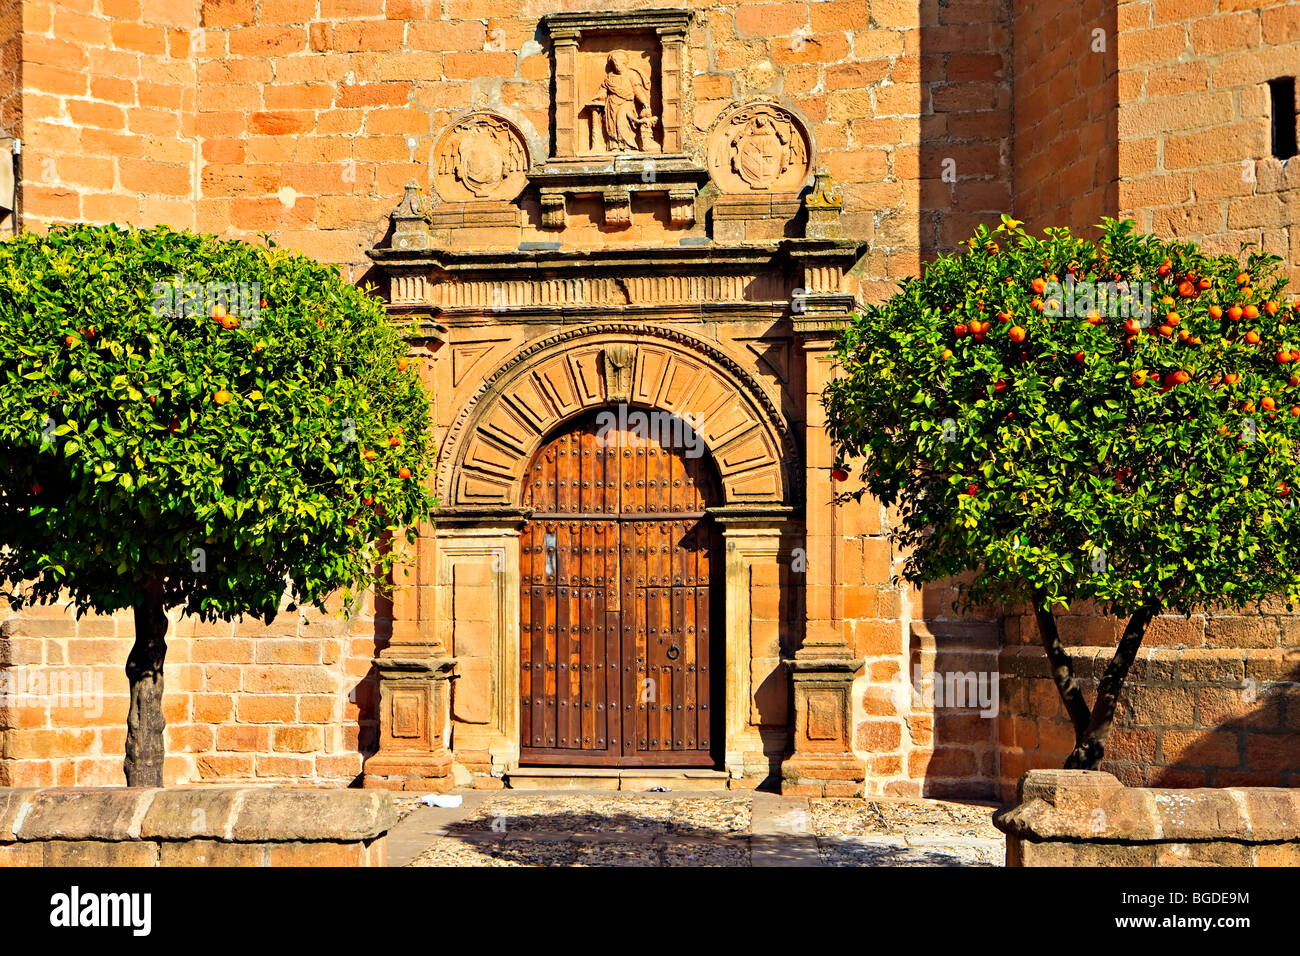 Iglesia de San Mateo in Plaza de la Constitucion, town of Banos de la Encina, Province of Jaen, Andalusia (Andalucia), - Stock Image